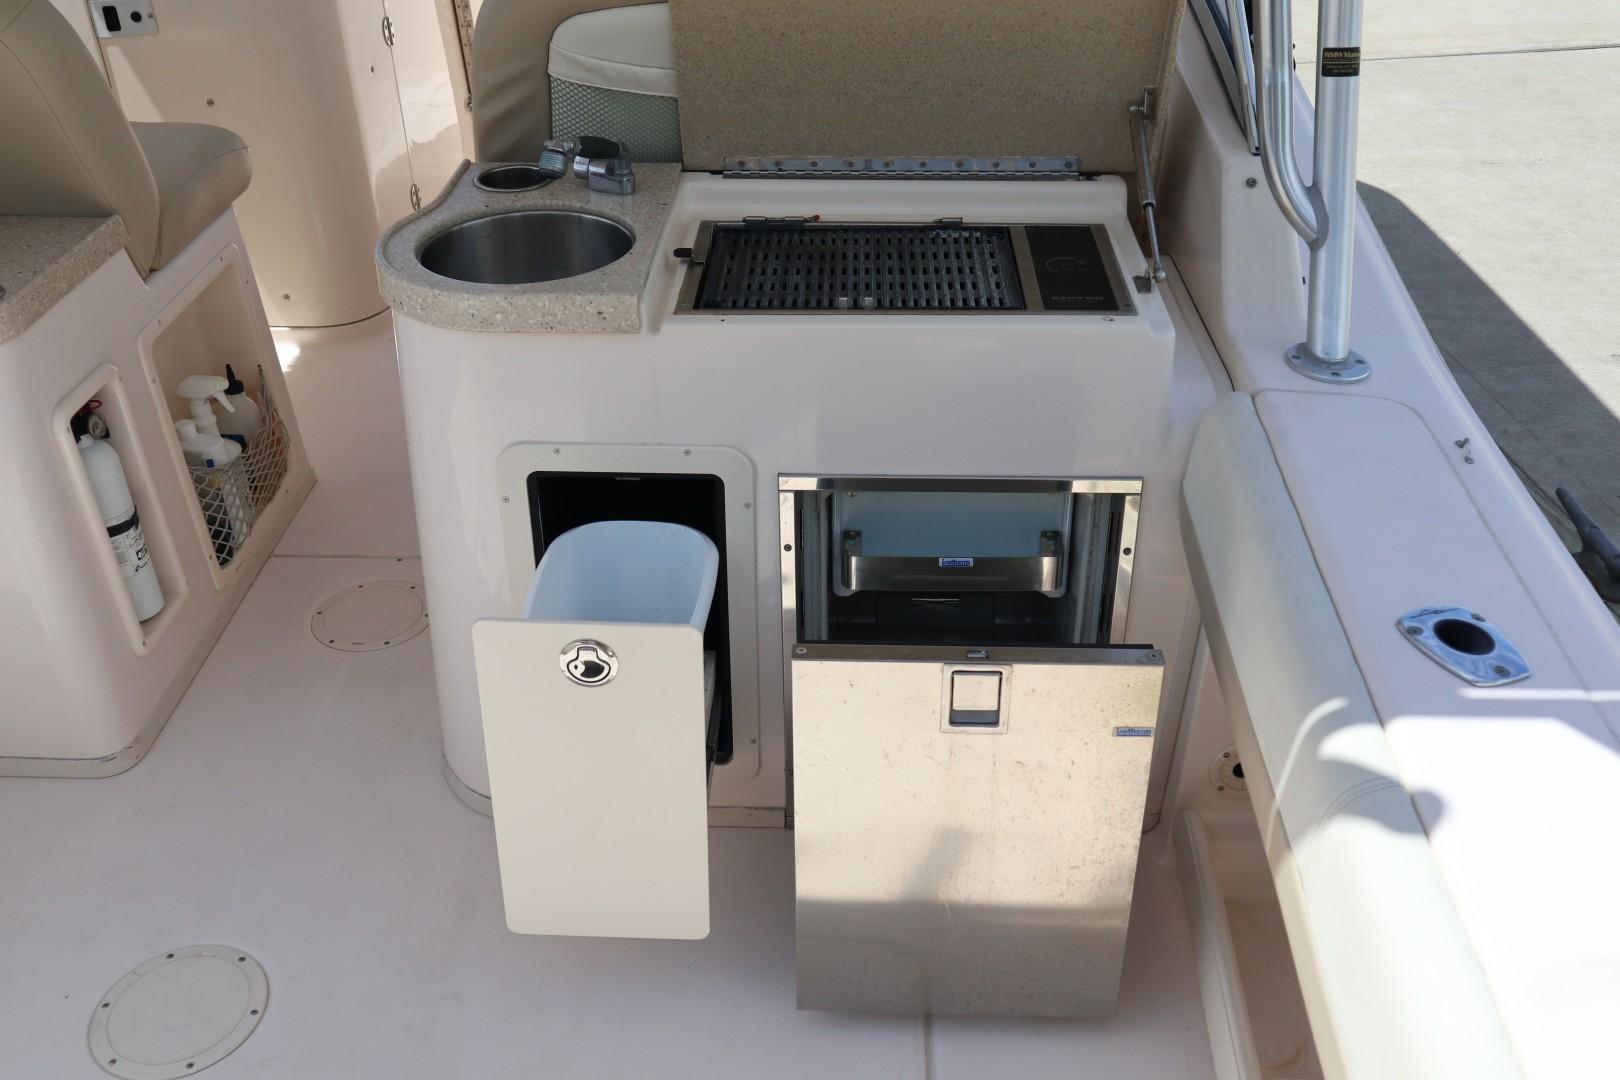 Grady-White 30 Sea Number - Sink/Refrigerator